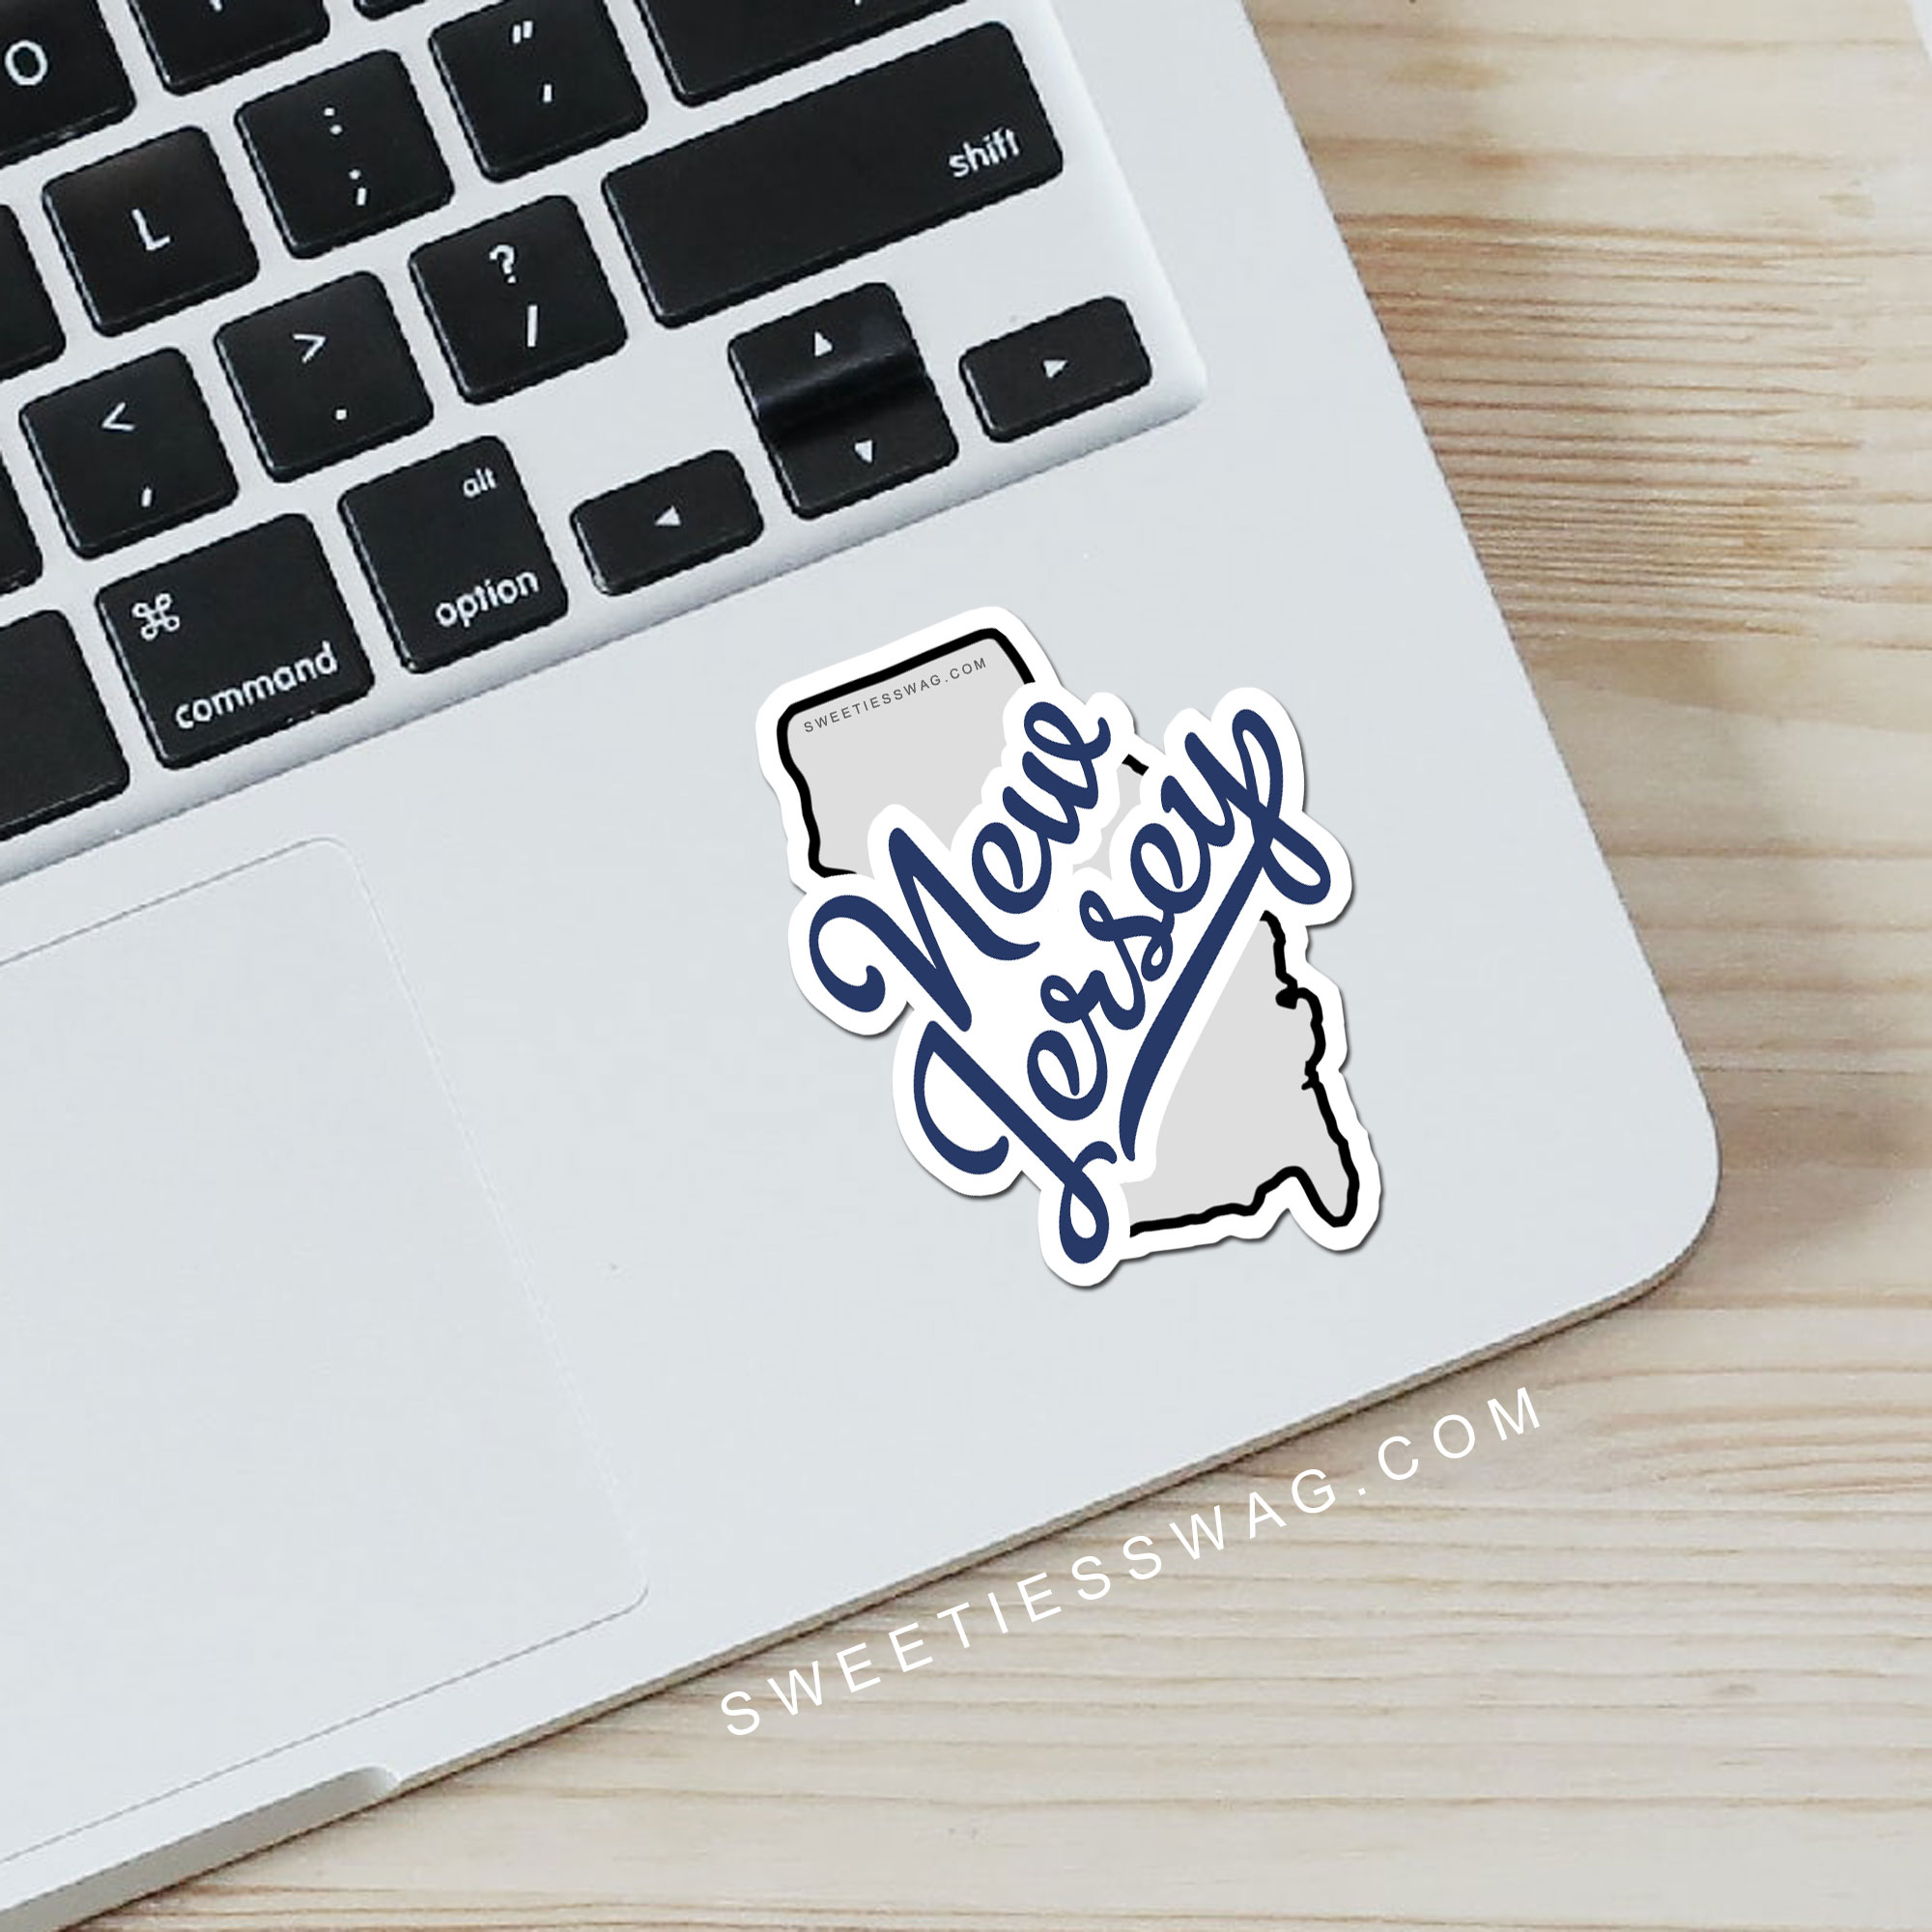 newjersey-state-sticker3